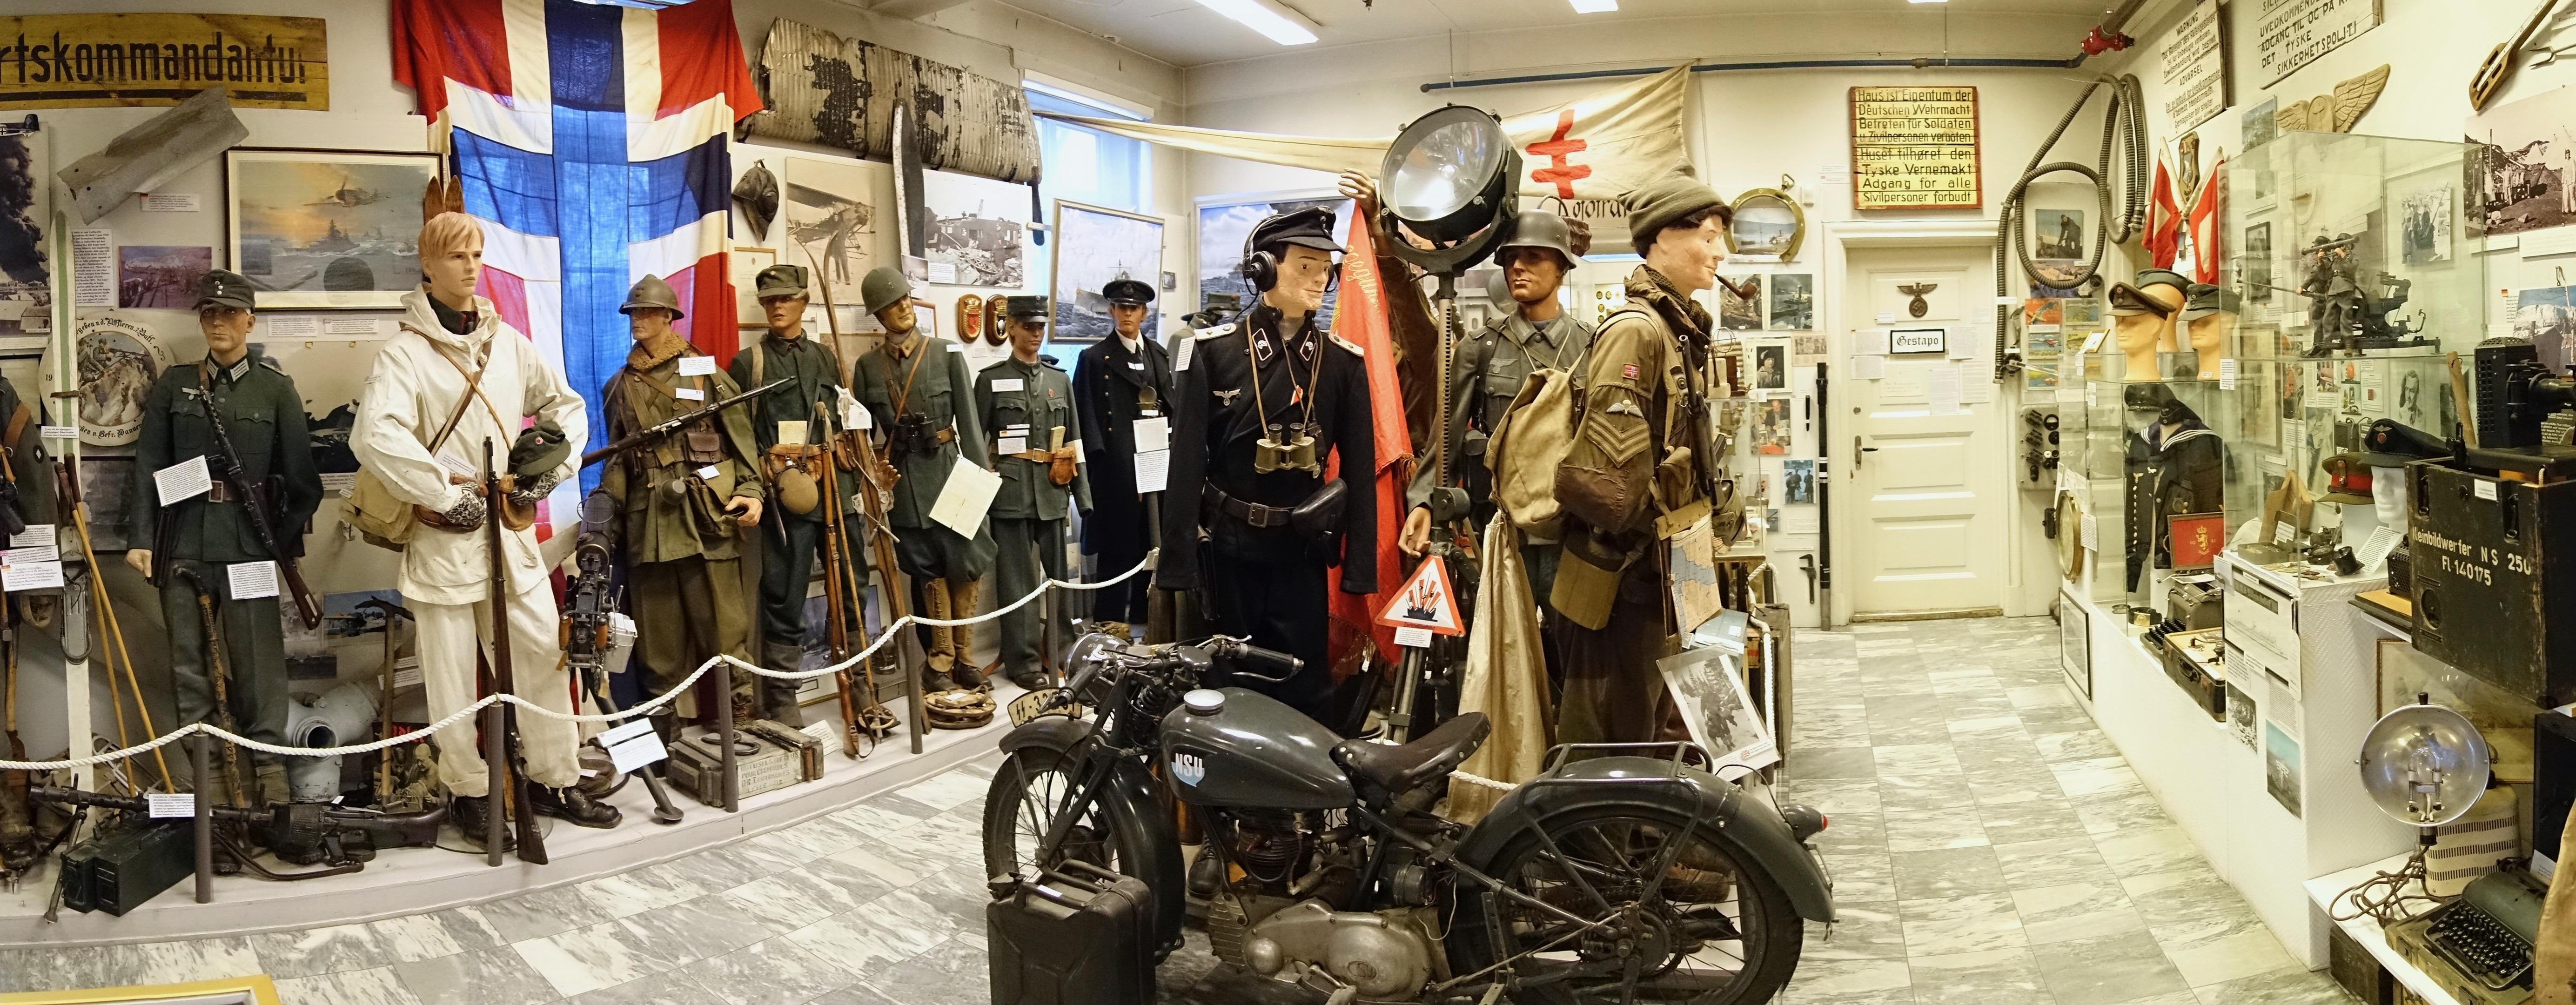 File:Misc  German, Norwegian, French, British uniforms